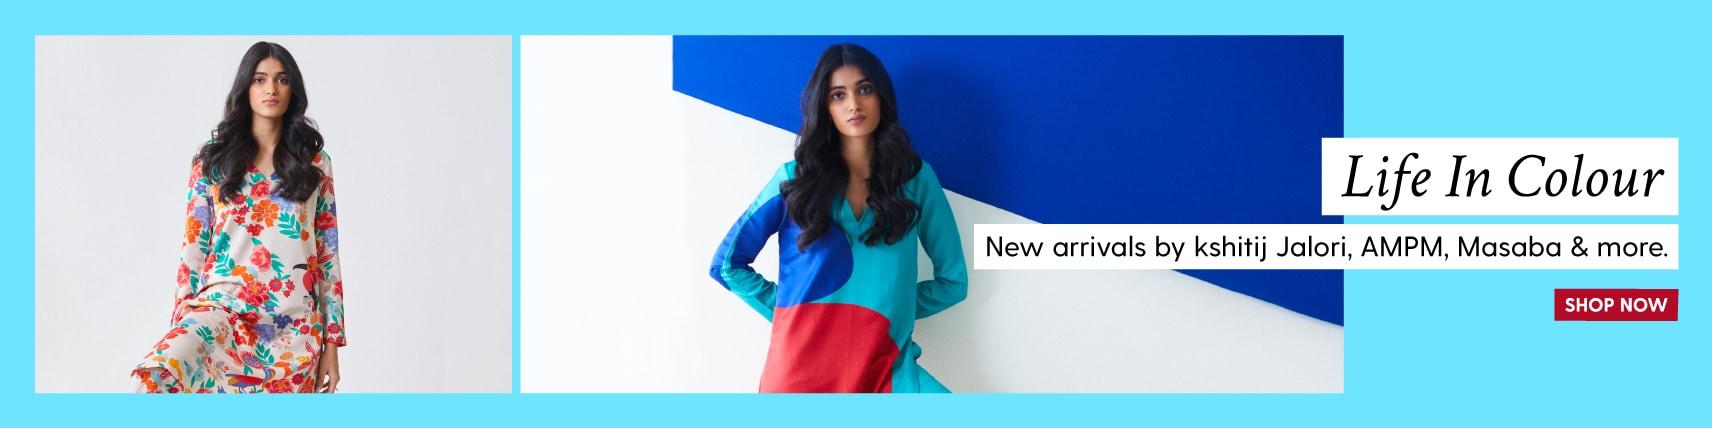 clothing/?designers=masaba130-jadebymonicaandkarishma-siddharthabansal-vidushigupta-gopivaid-kiranuttamghosh-yashodhara130-kshitijjalori-ampm&=&utm_source=LandingPage&utm_medium=Banner&utm_campaign=NewArrivals